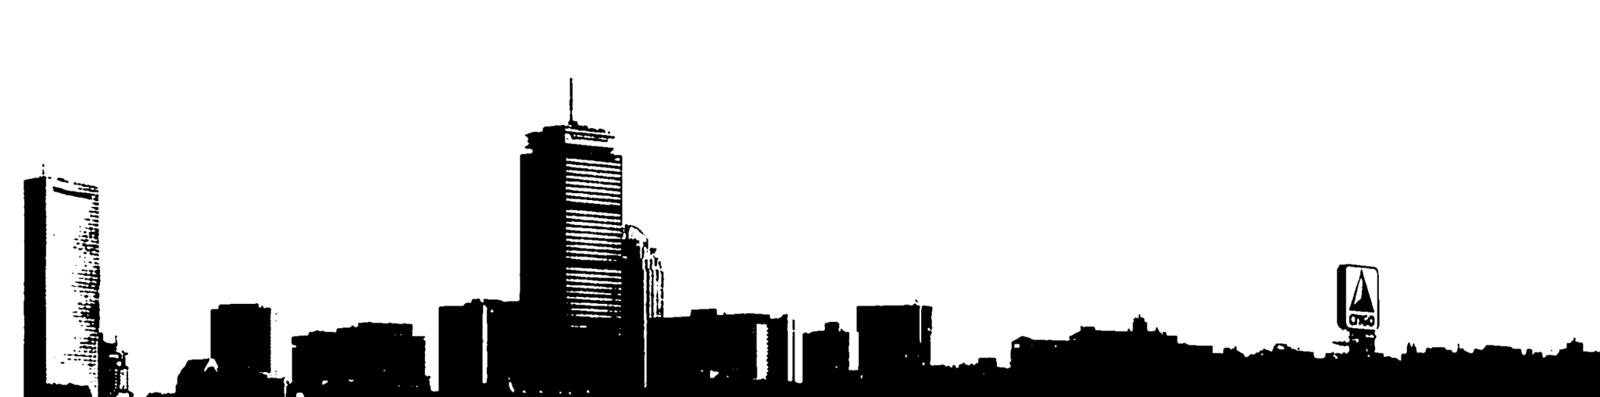 Boston Silhouette Cropped